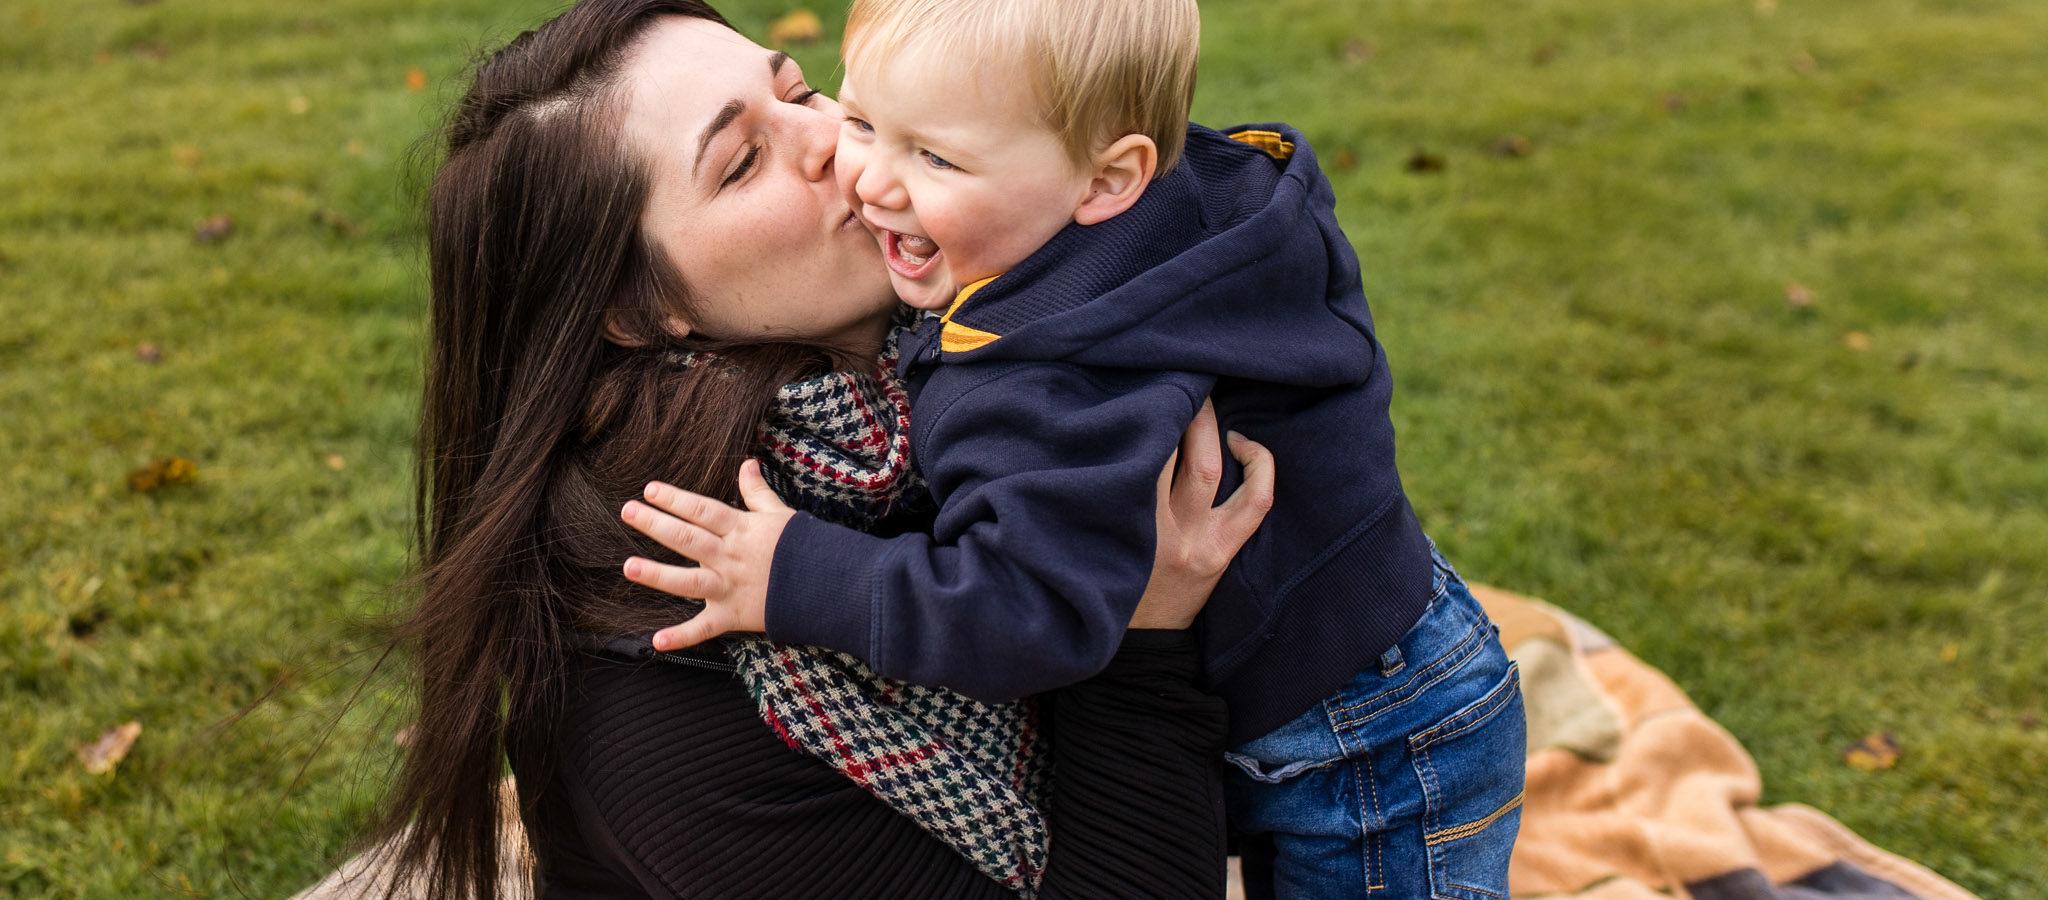 Mum kissing child - family photographer aberdeen aberdeenshire - leith hall - debbie dee photography